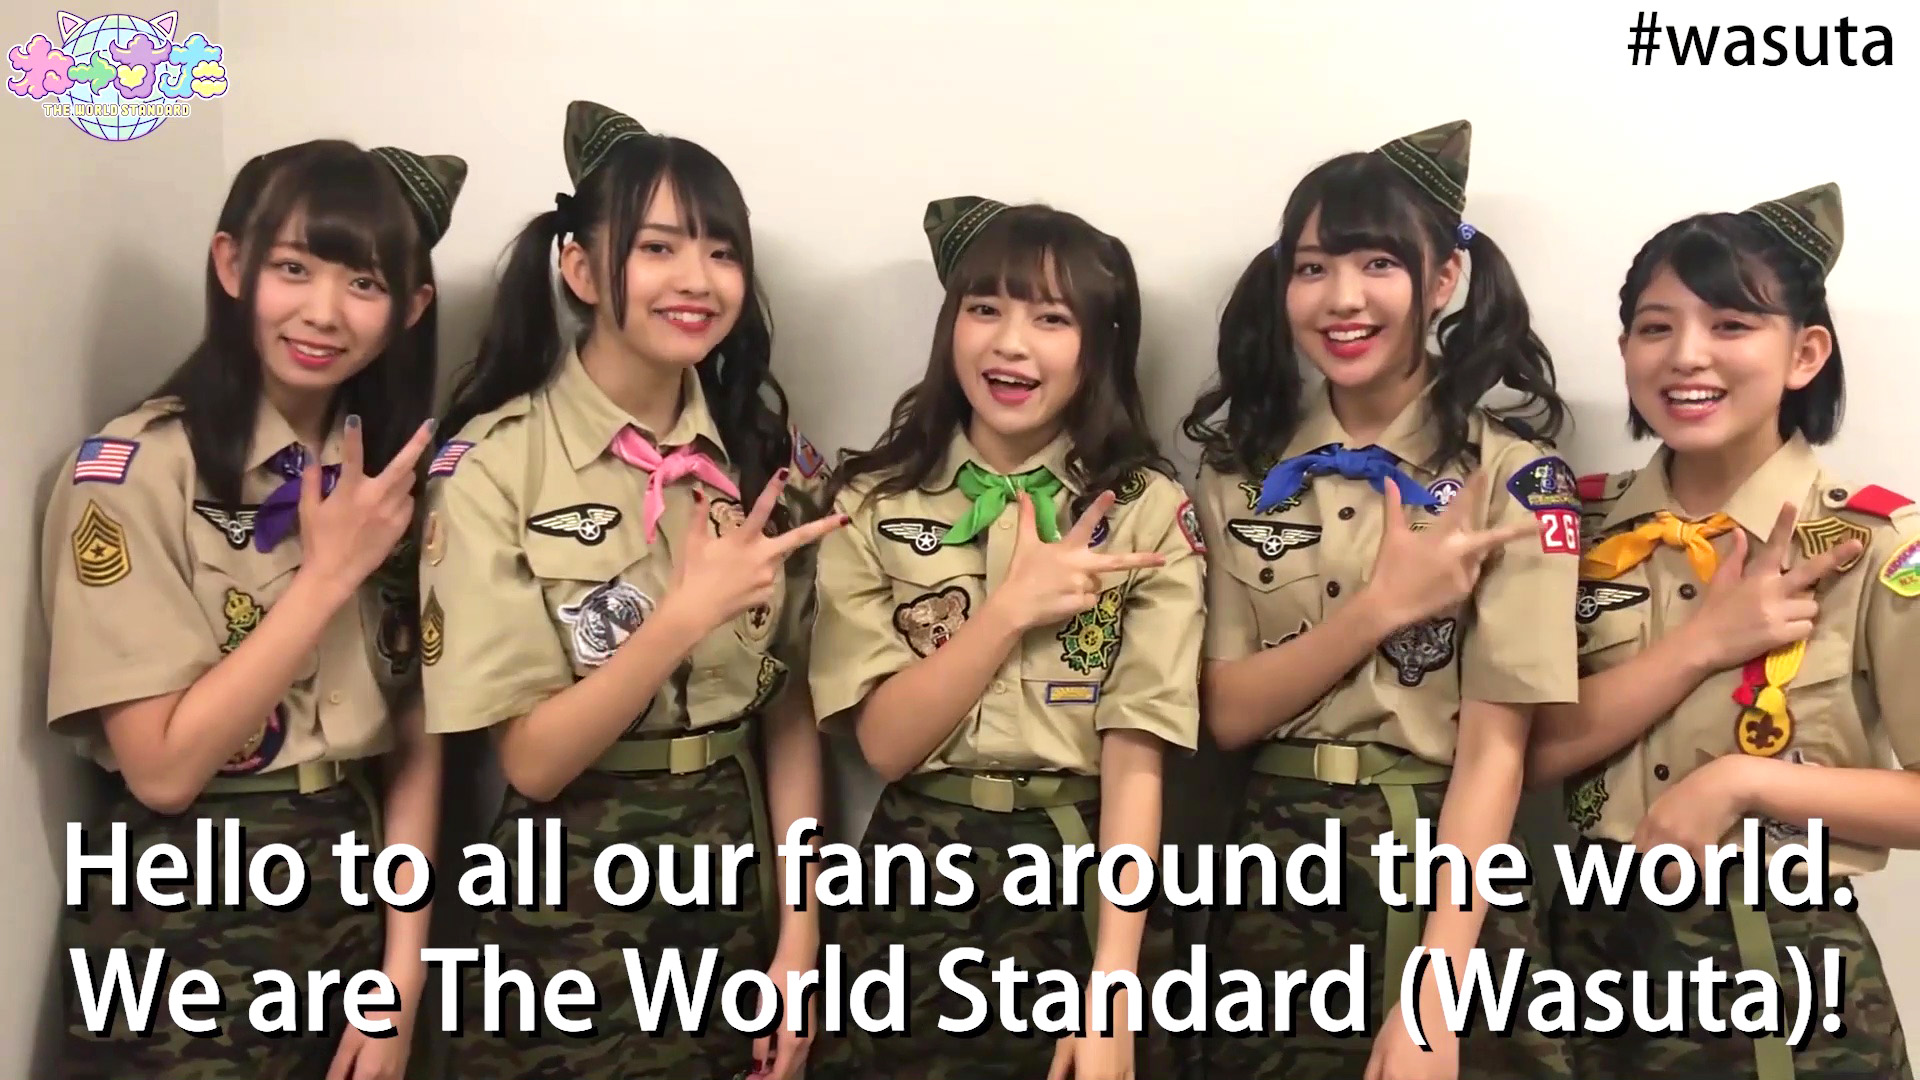 RMMS-Wasuta-100k-Facebook-1